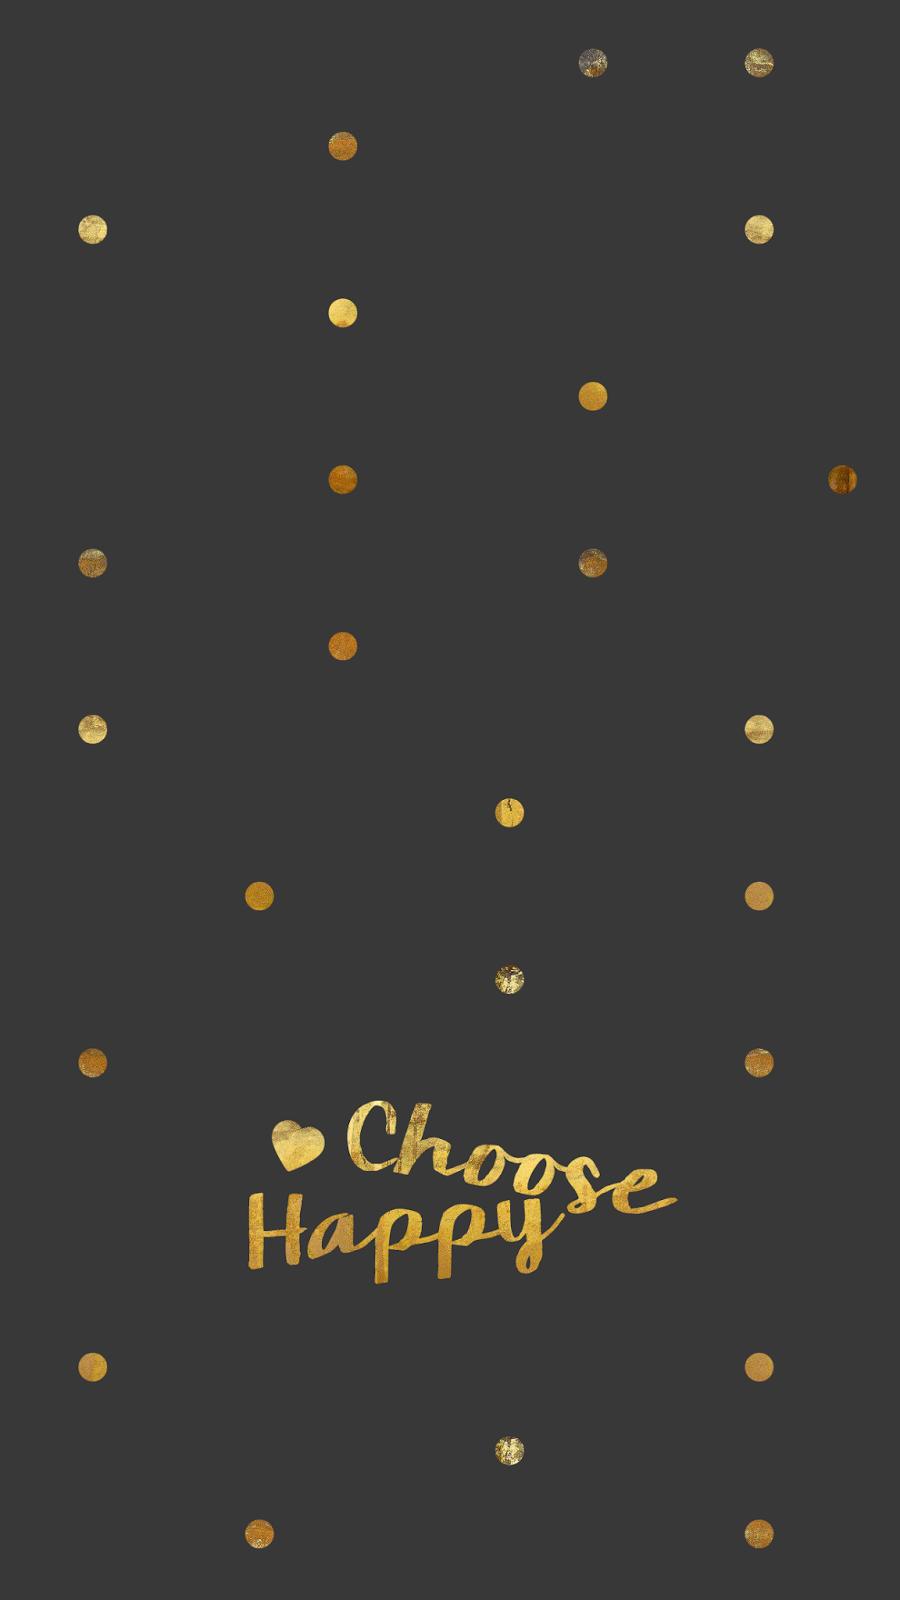 Merveilleux Wallpaper, Background, Hd, Iphone, Gold, Confetti, Black, Choose Happy